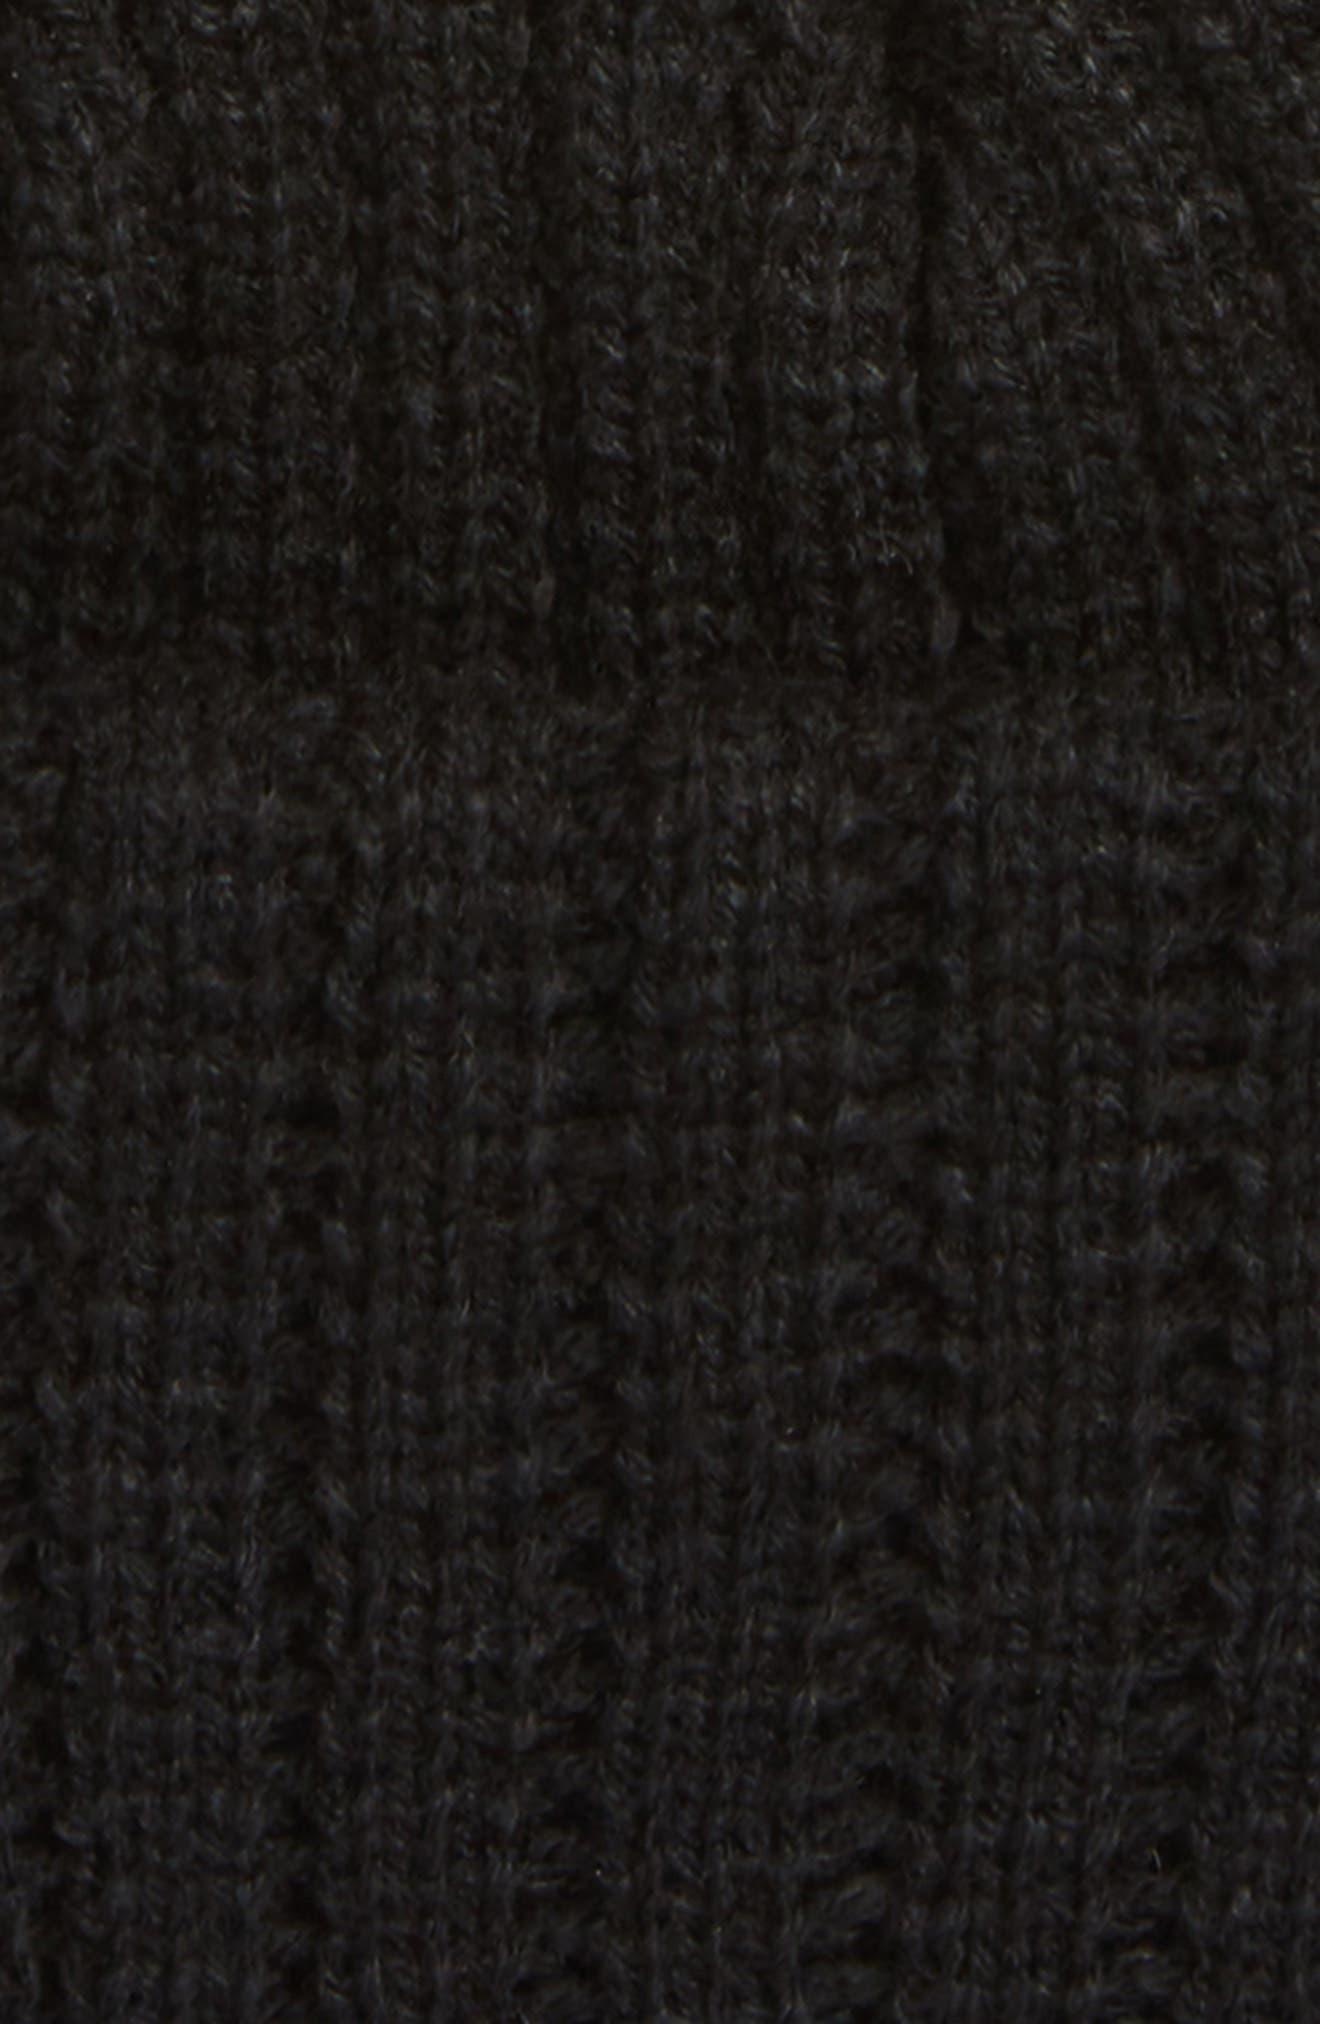 Knit Skull Cap,                             Alternate thumbnail 2, color,                             001